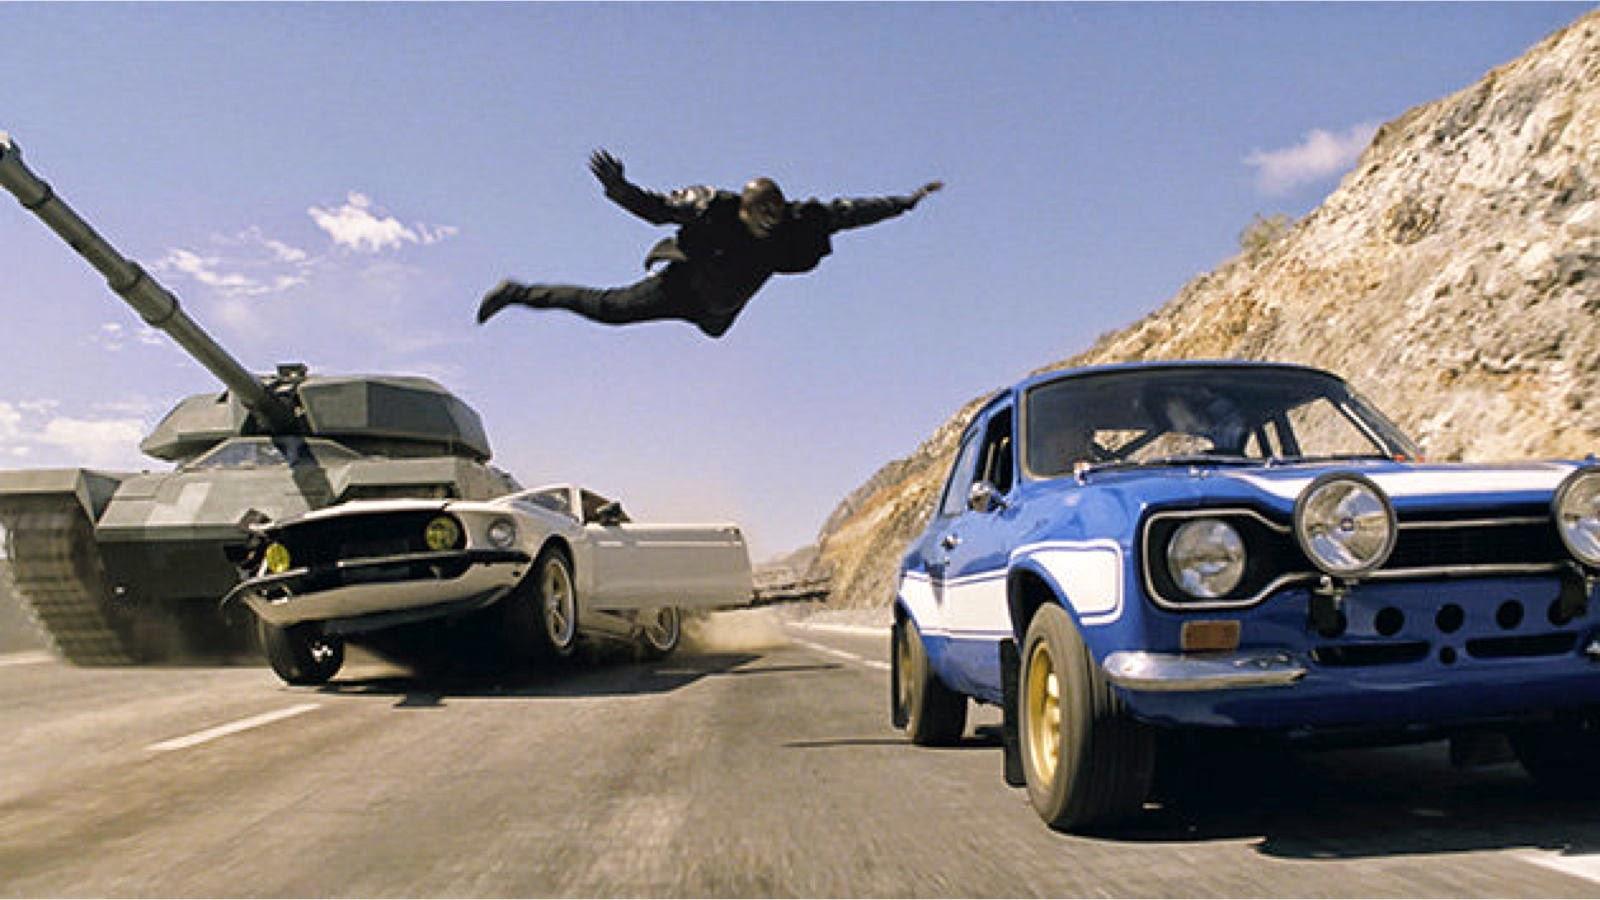 http://1.bp.blogspot.com/-h6QtFtT0rk8/U9lBIf426eI/AAAAAAAAaD0/iqPfNCl5Fp8/s1600/Fast-Furious-6-2013.jpg